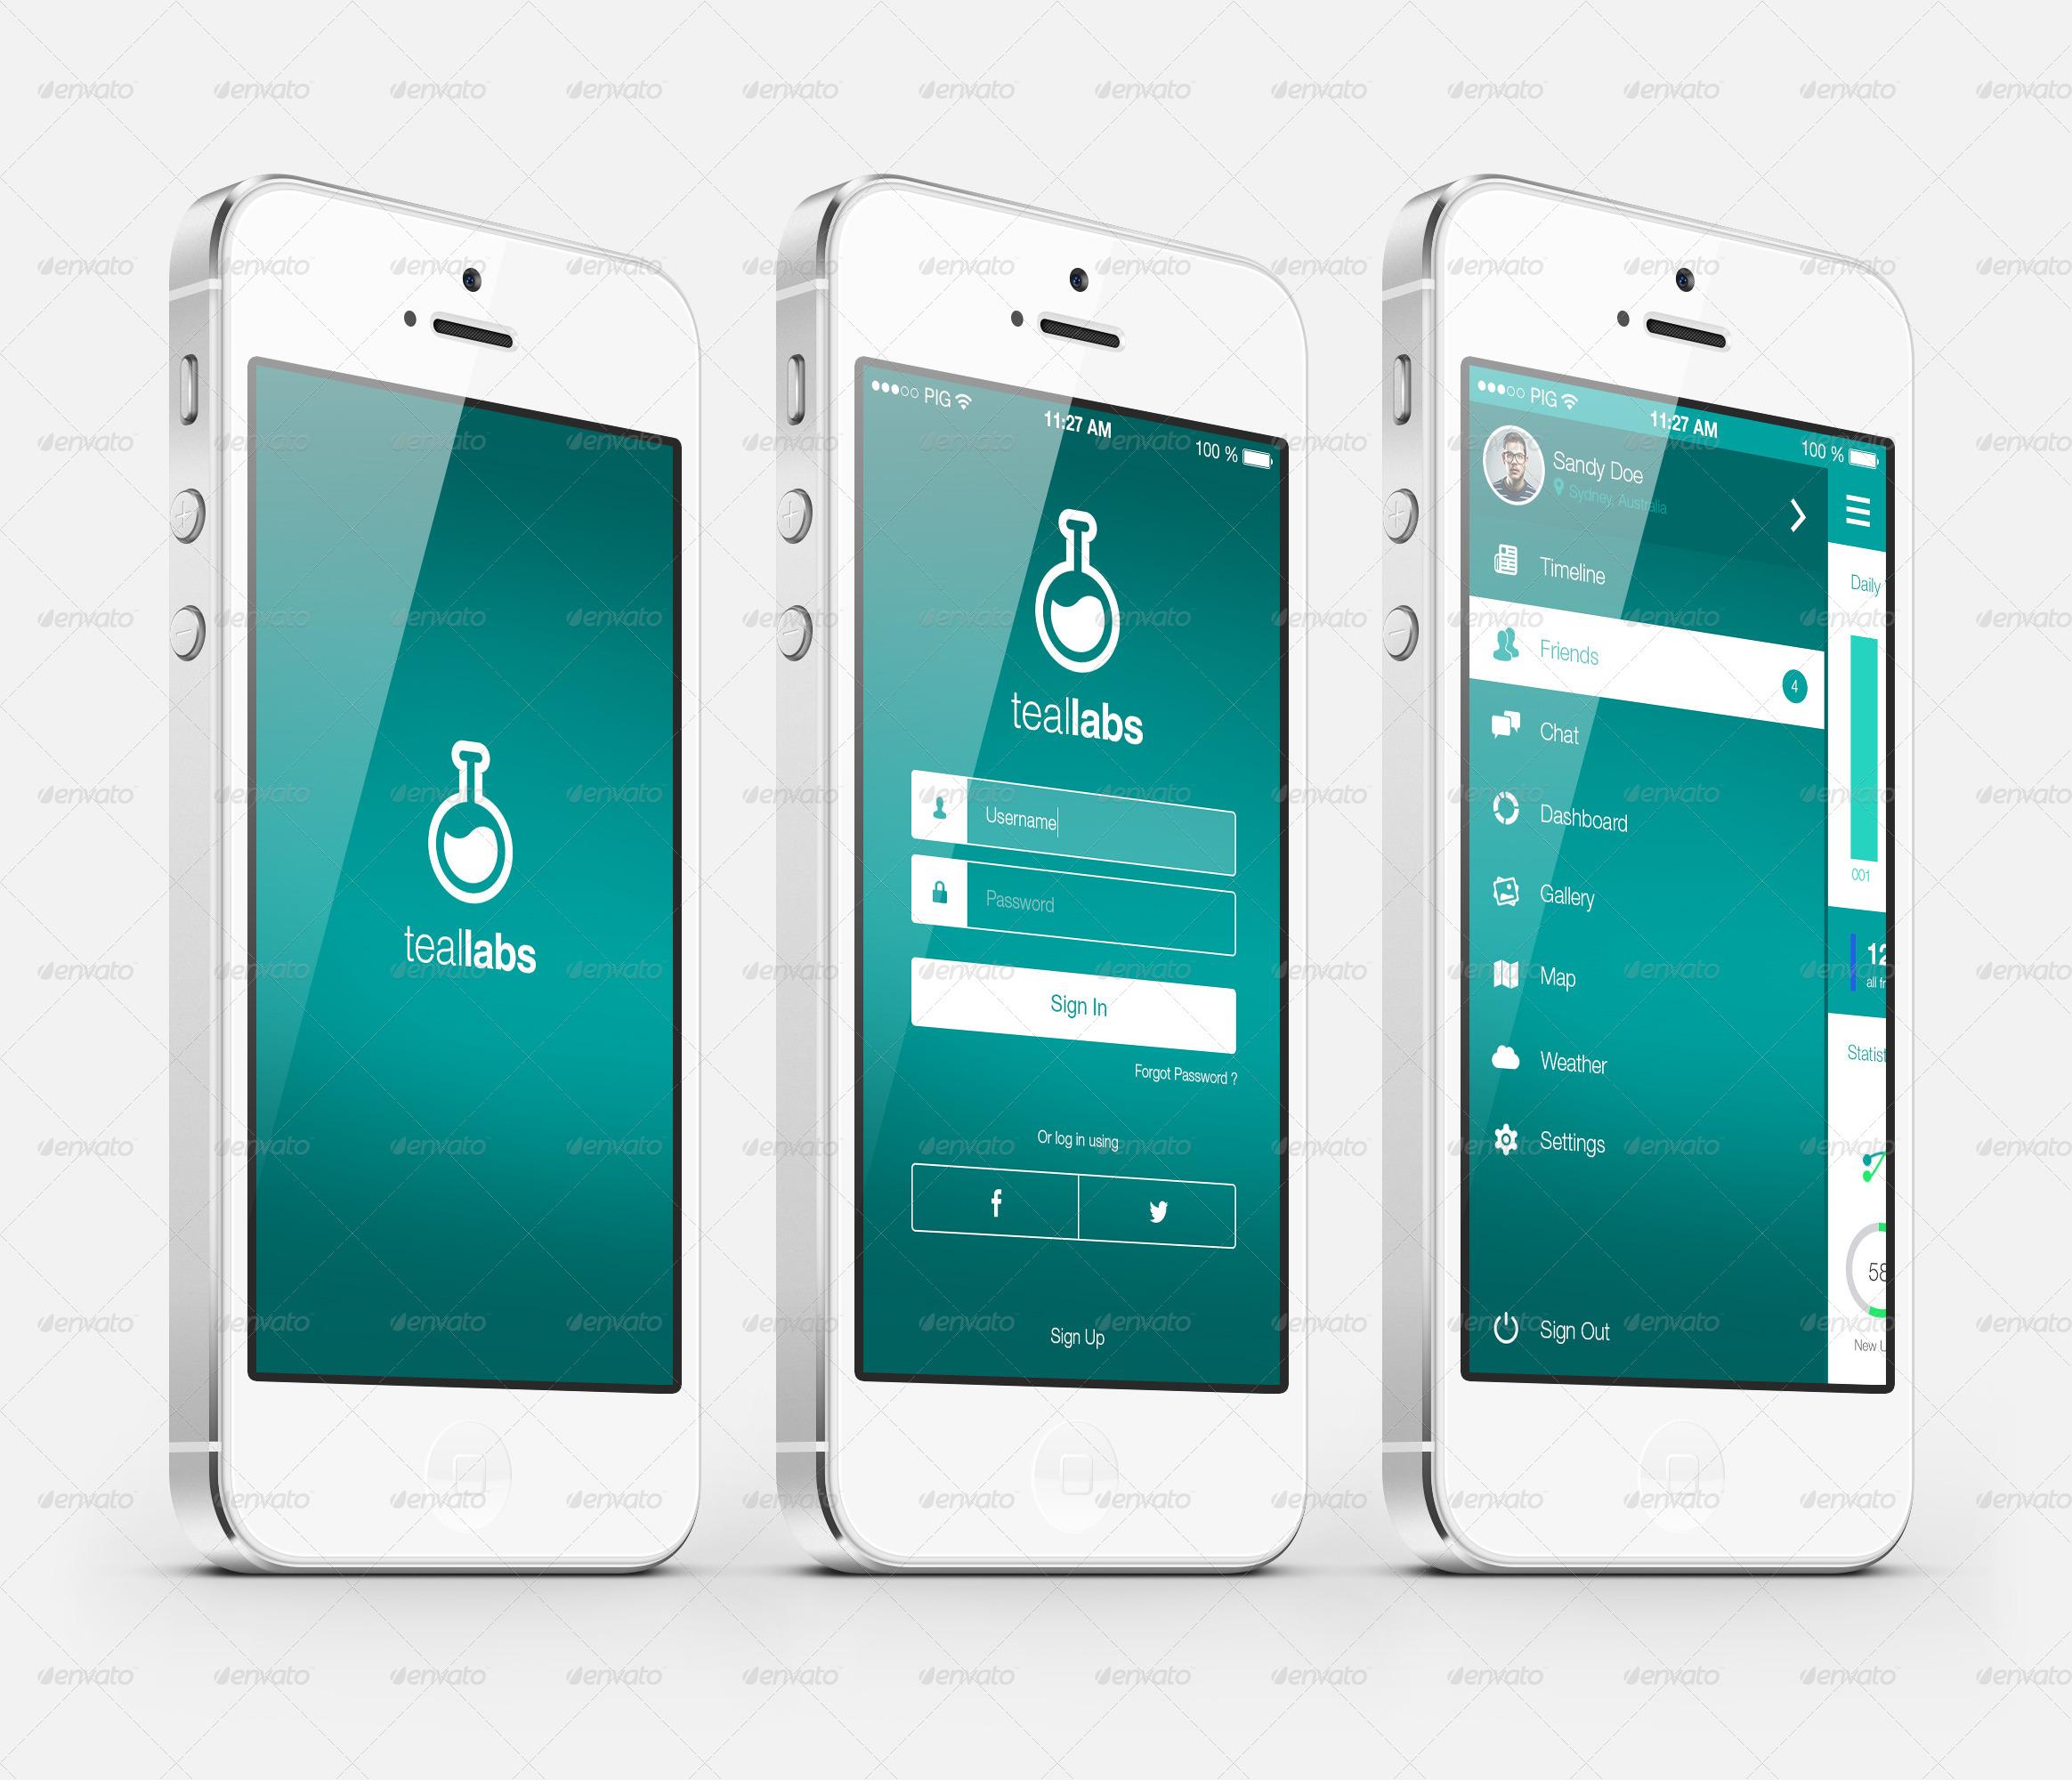 Modern & Cool Teal Flat Mobile UI Kit By Mondz